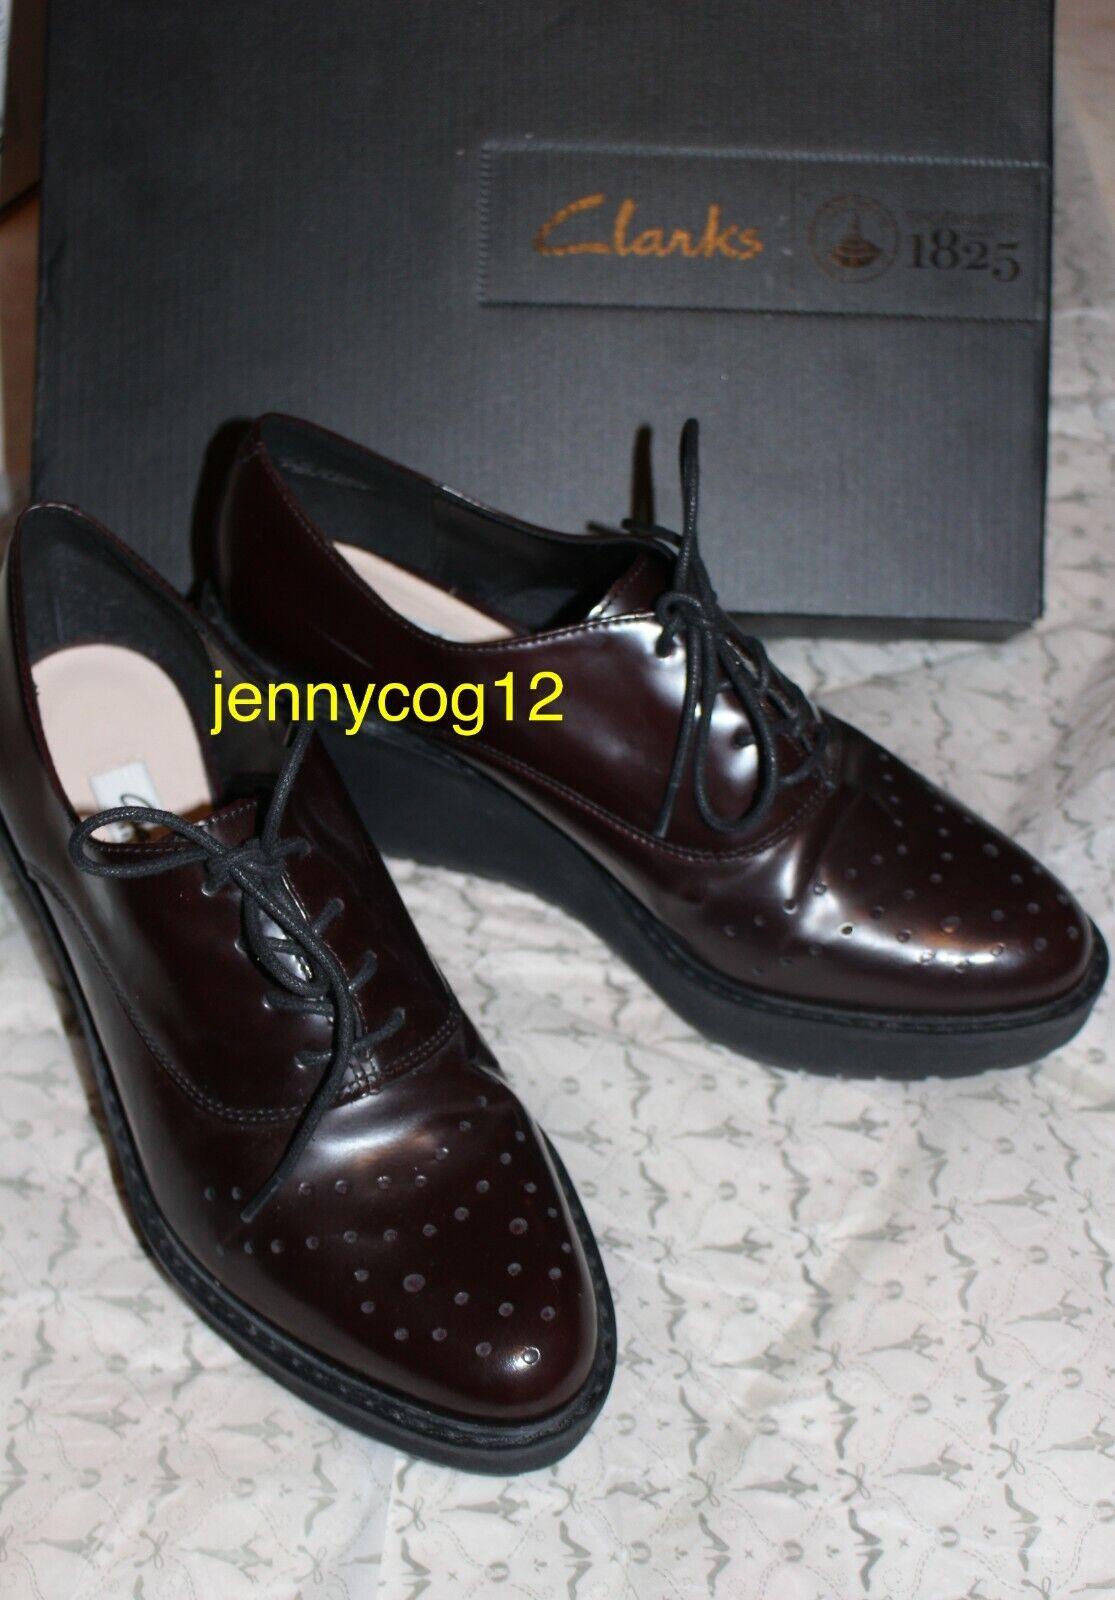 Clarks Clarks Clarks Ladies GAME OVAL BURGUNDY LEATHER Platform Wedge Heel Brogues shoes 6 D d61863